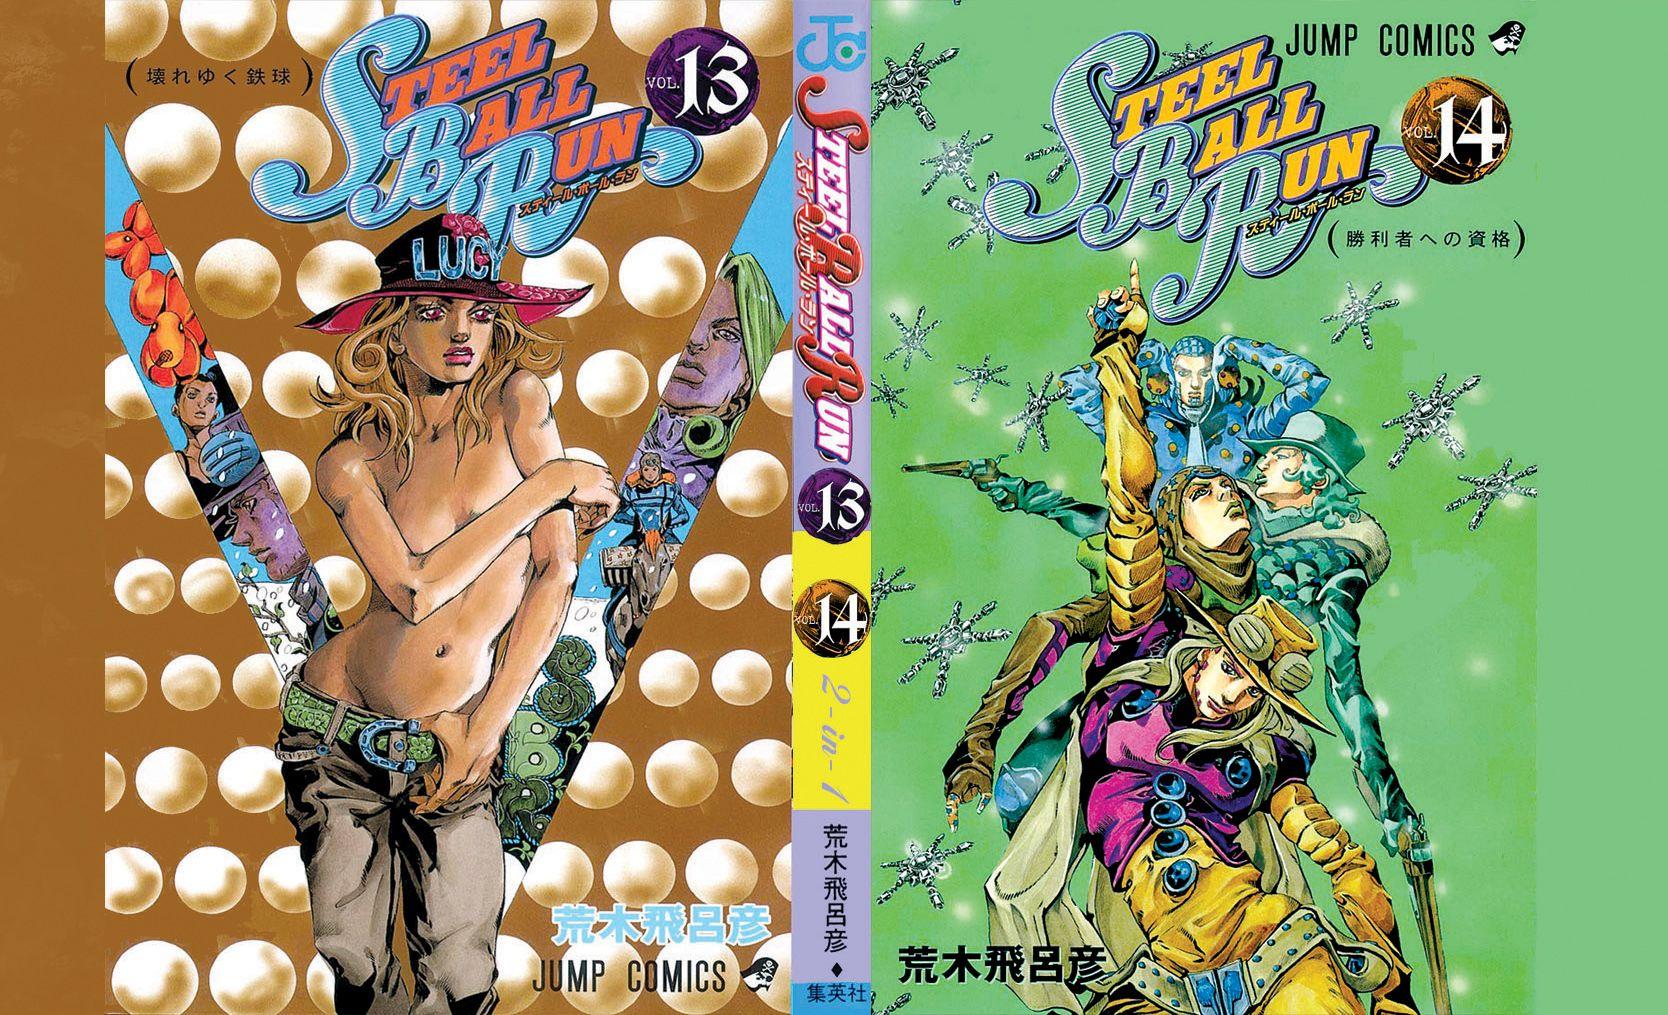 Jojo S Bizarre Adventure Part 7 Steel Ball Run Volume 13 14 Front Back Cover Jojo S Bizarre Adventure Jojo Bizarre Ball Run